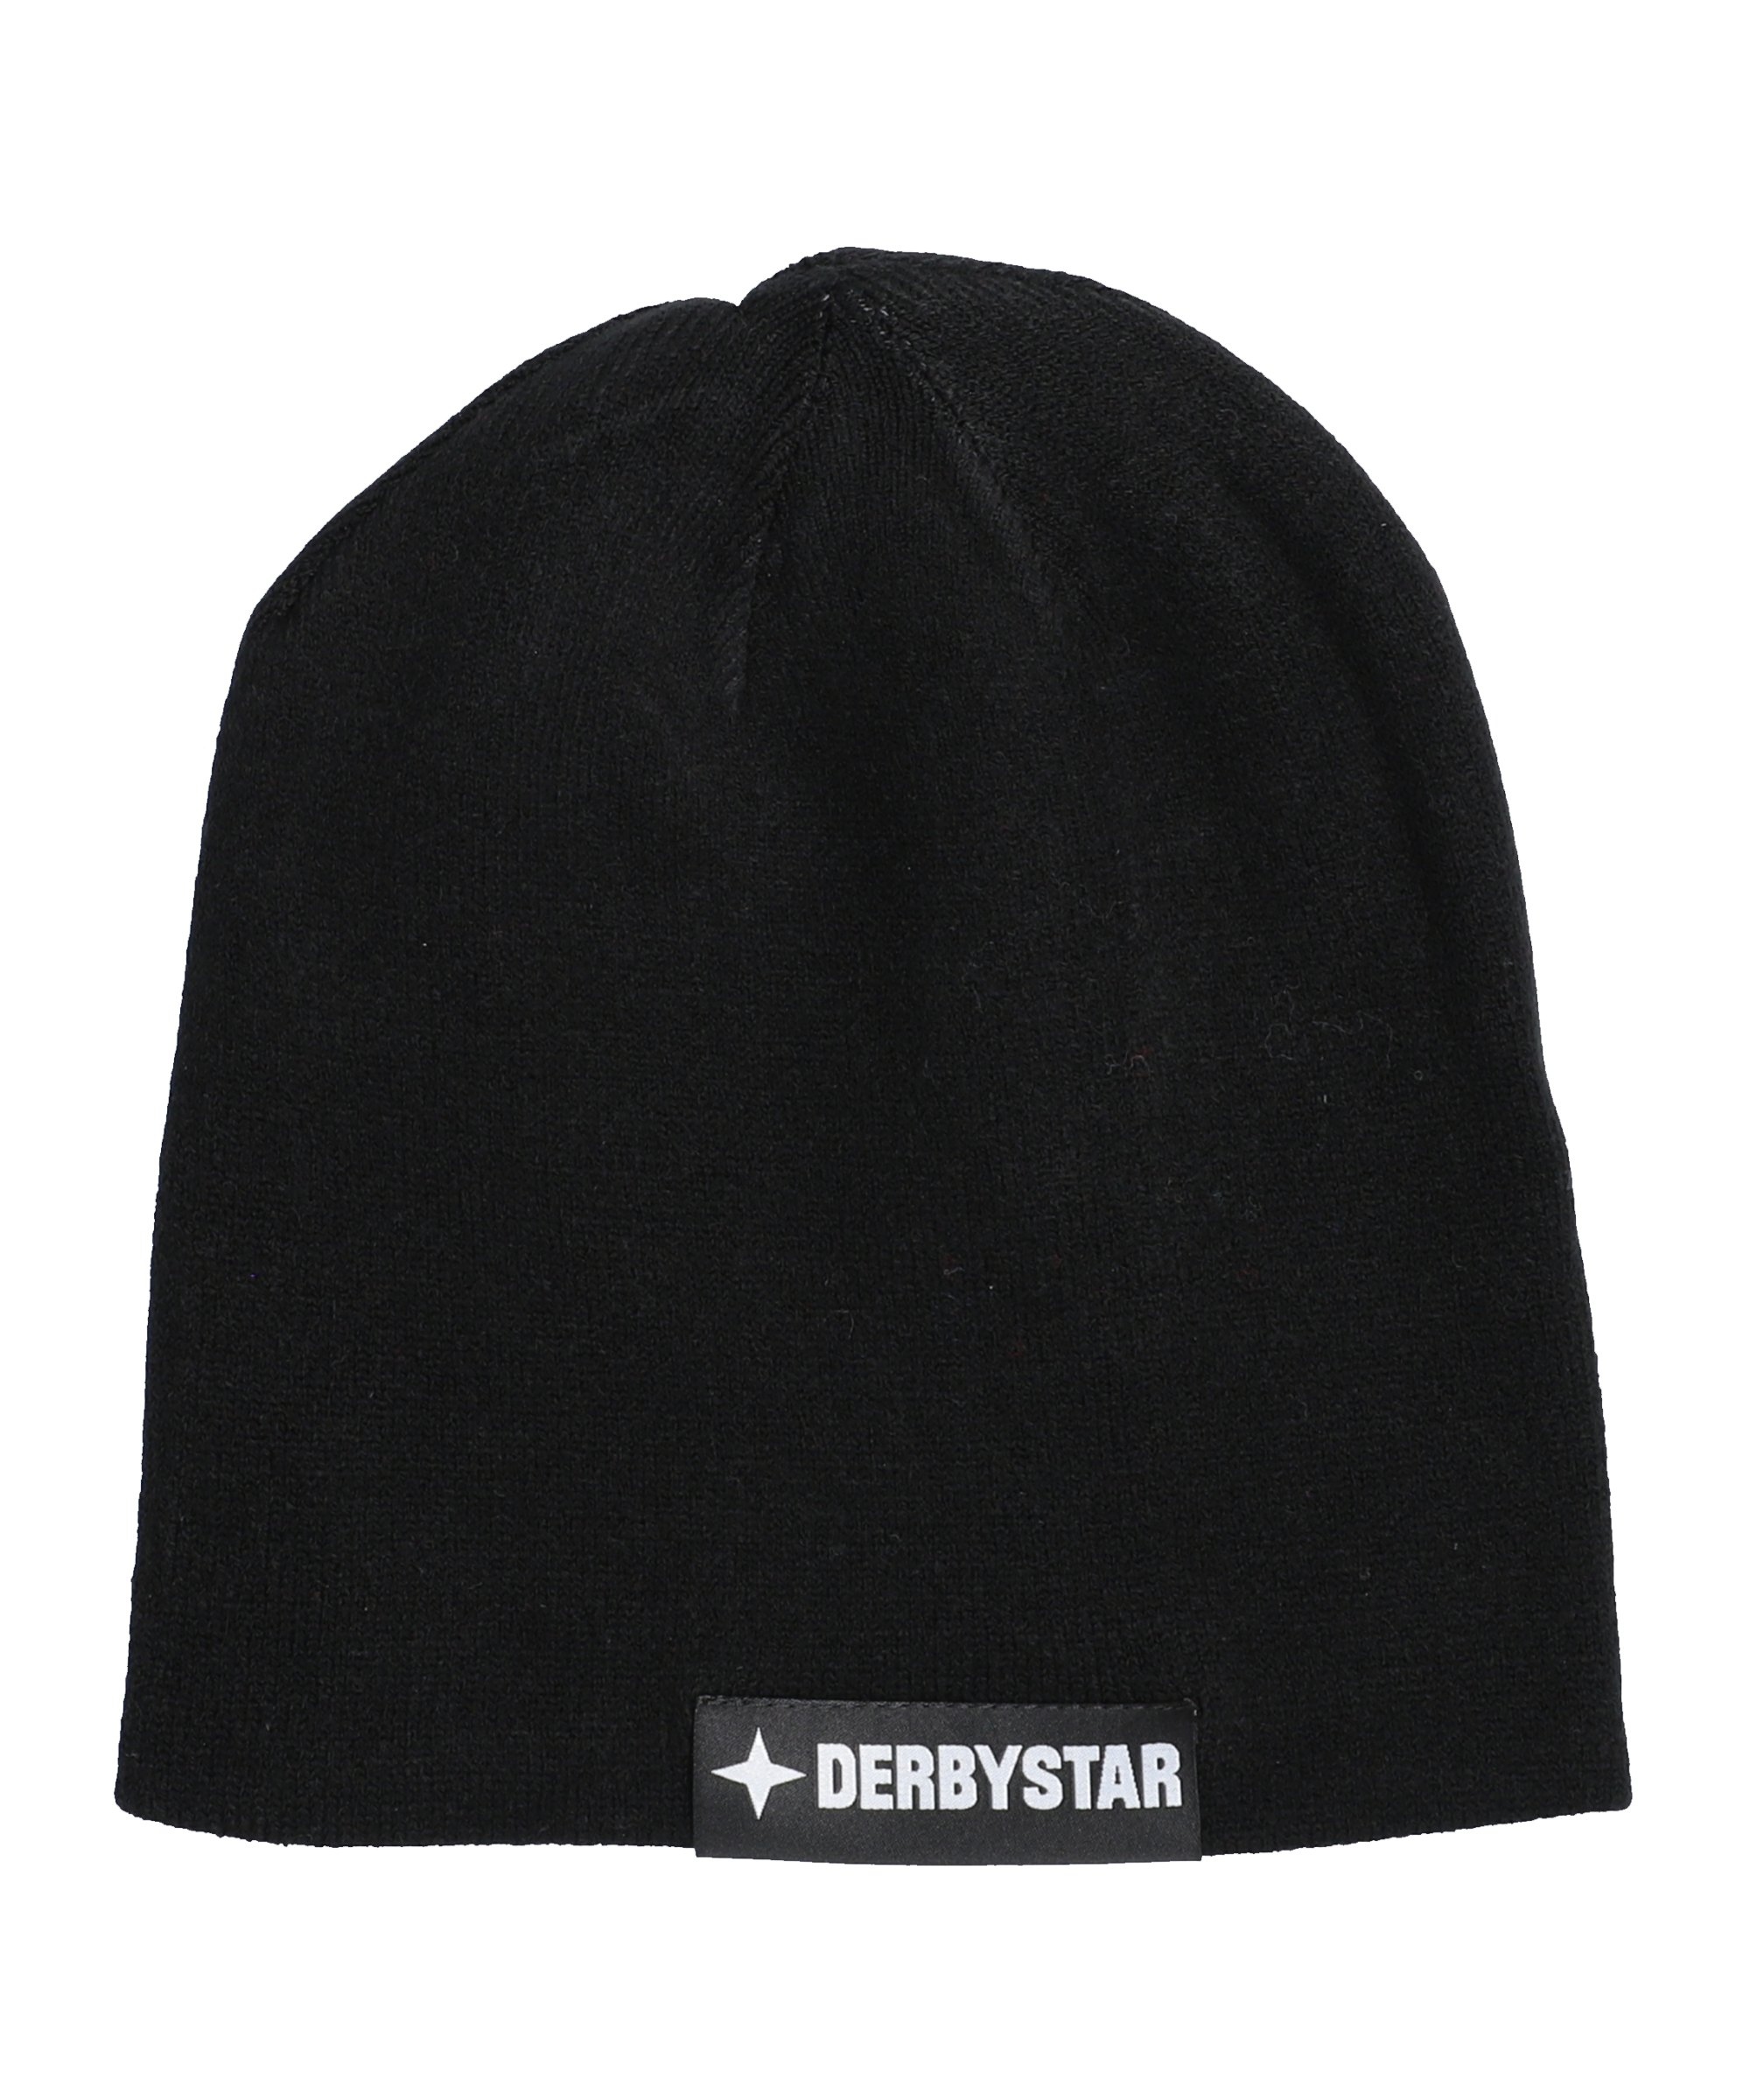 Derbystar v20 Strickmütze Schwarz F200 - schwarz